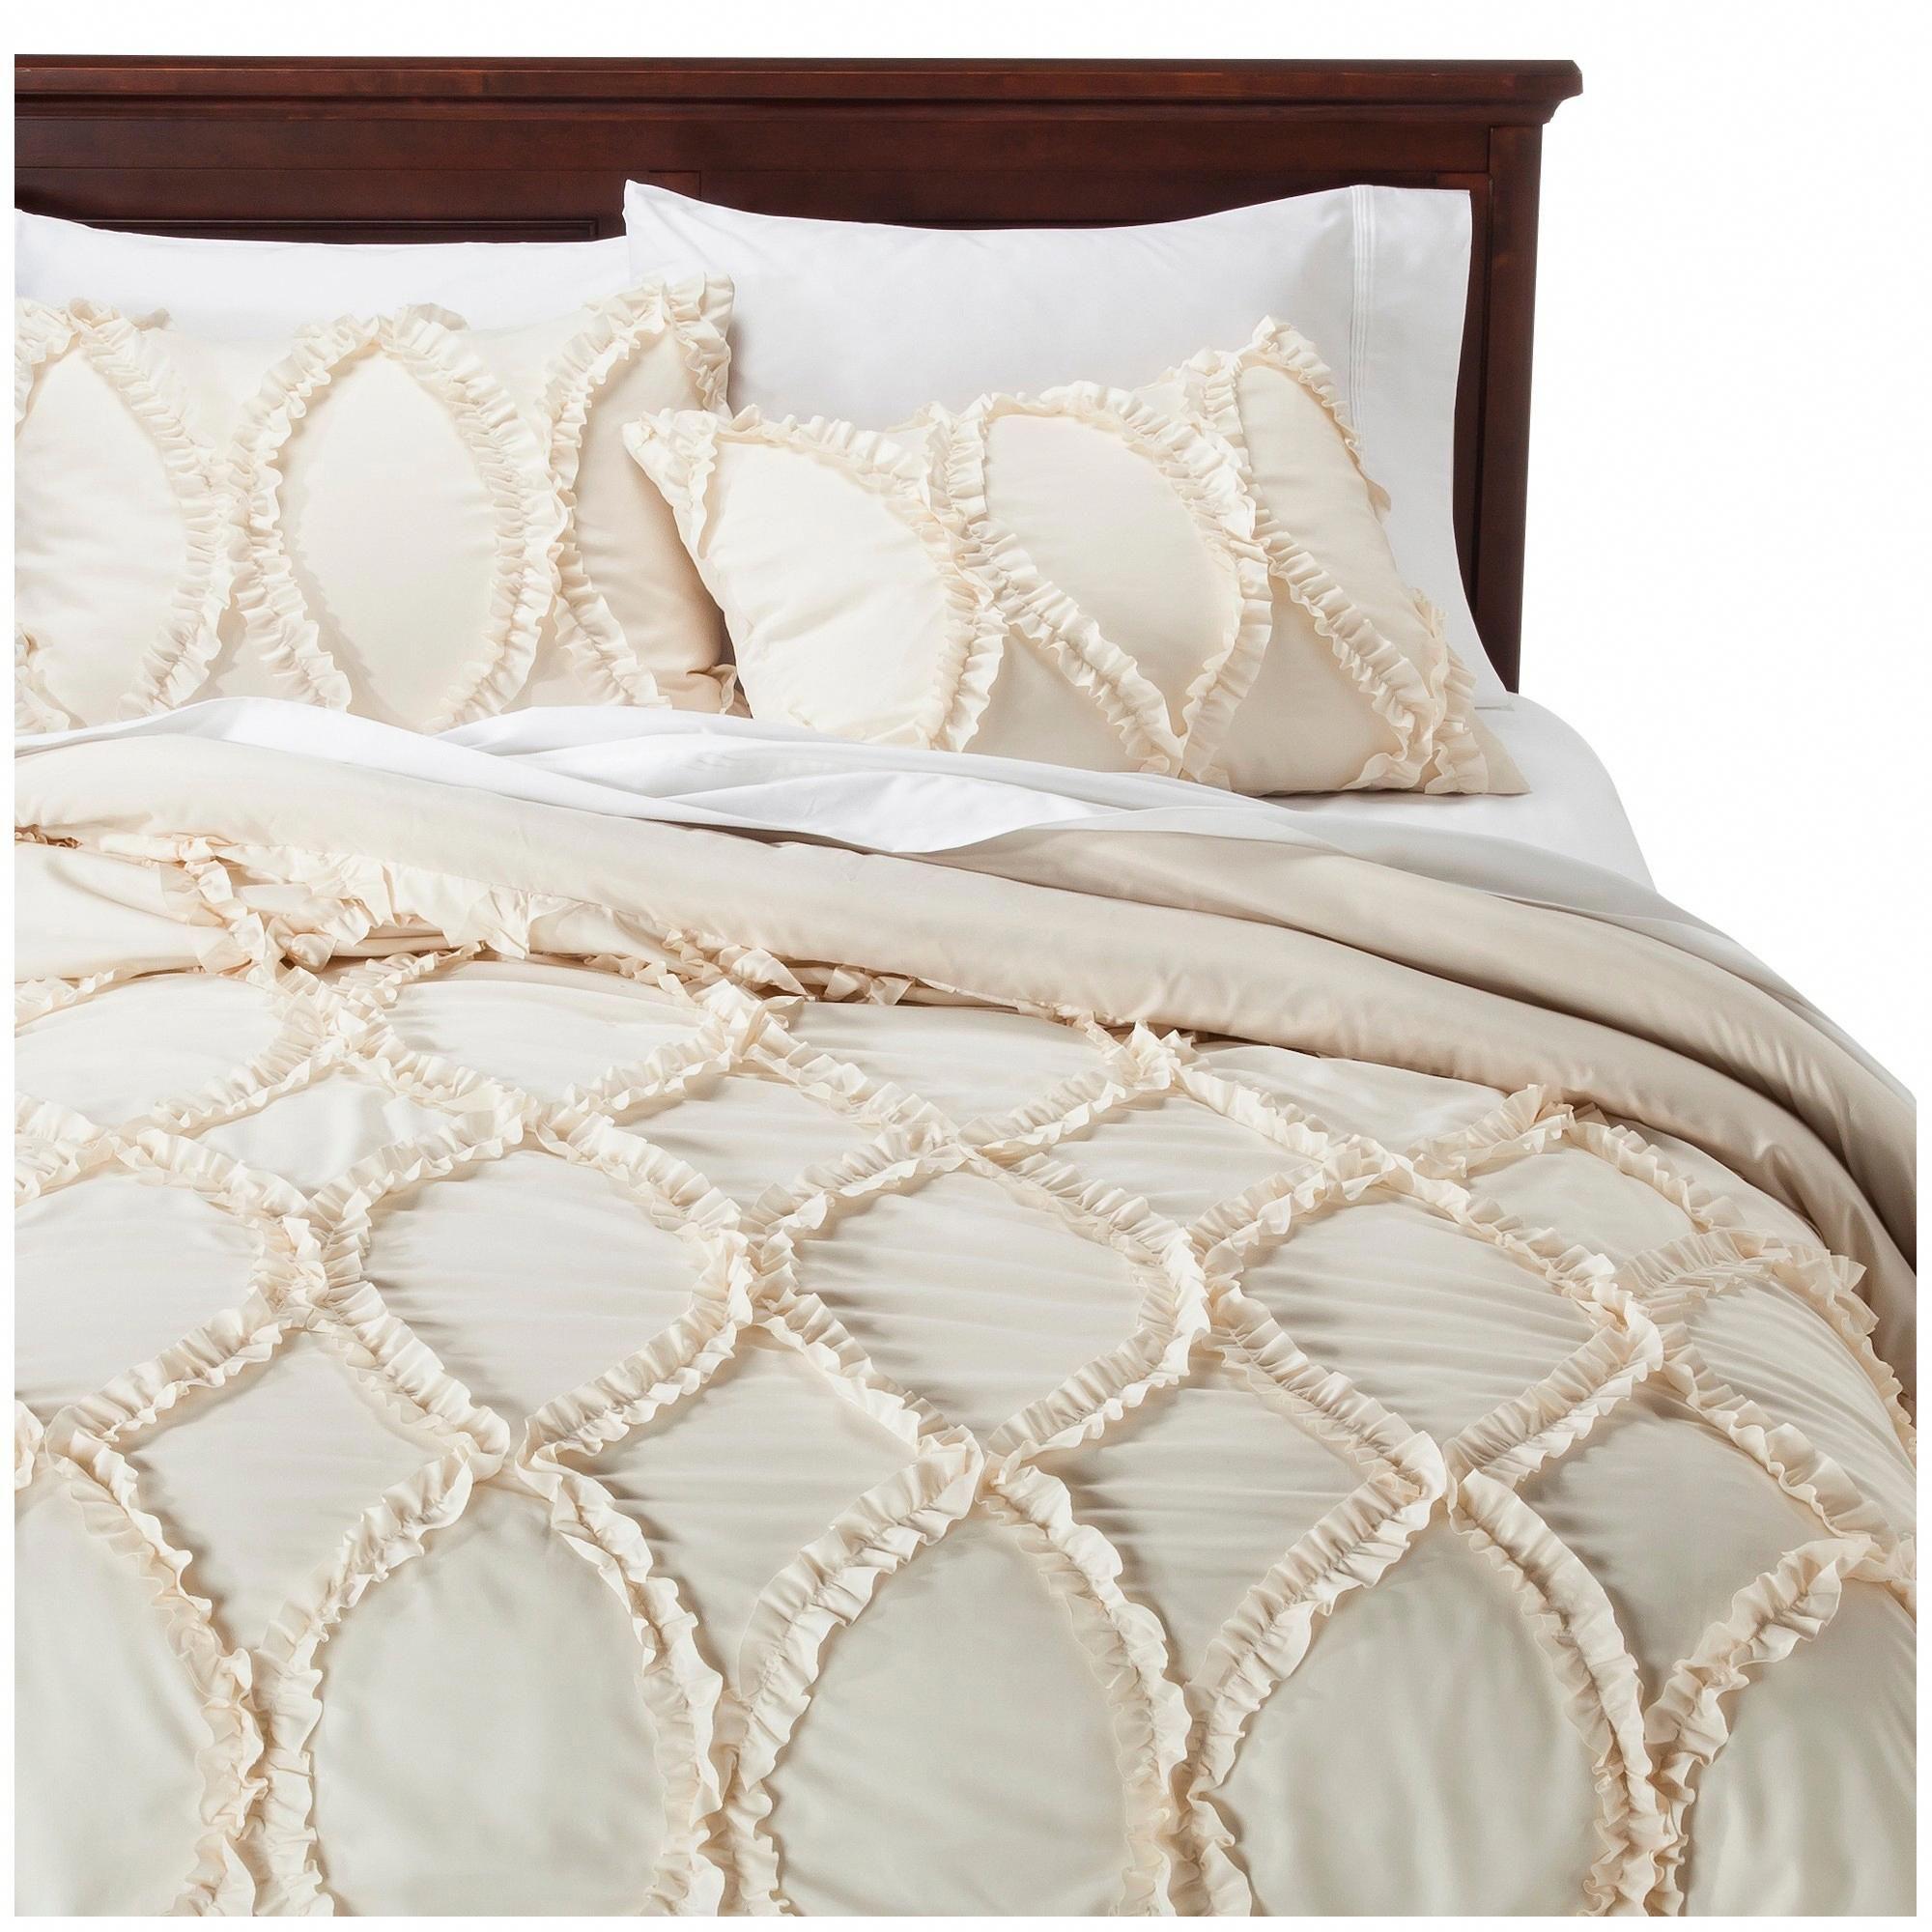 Avon ogee texture comforter set king ivory 3pc lush